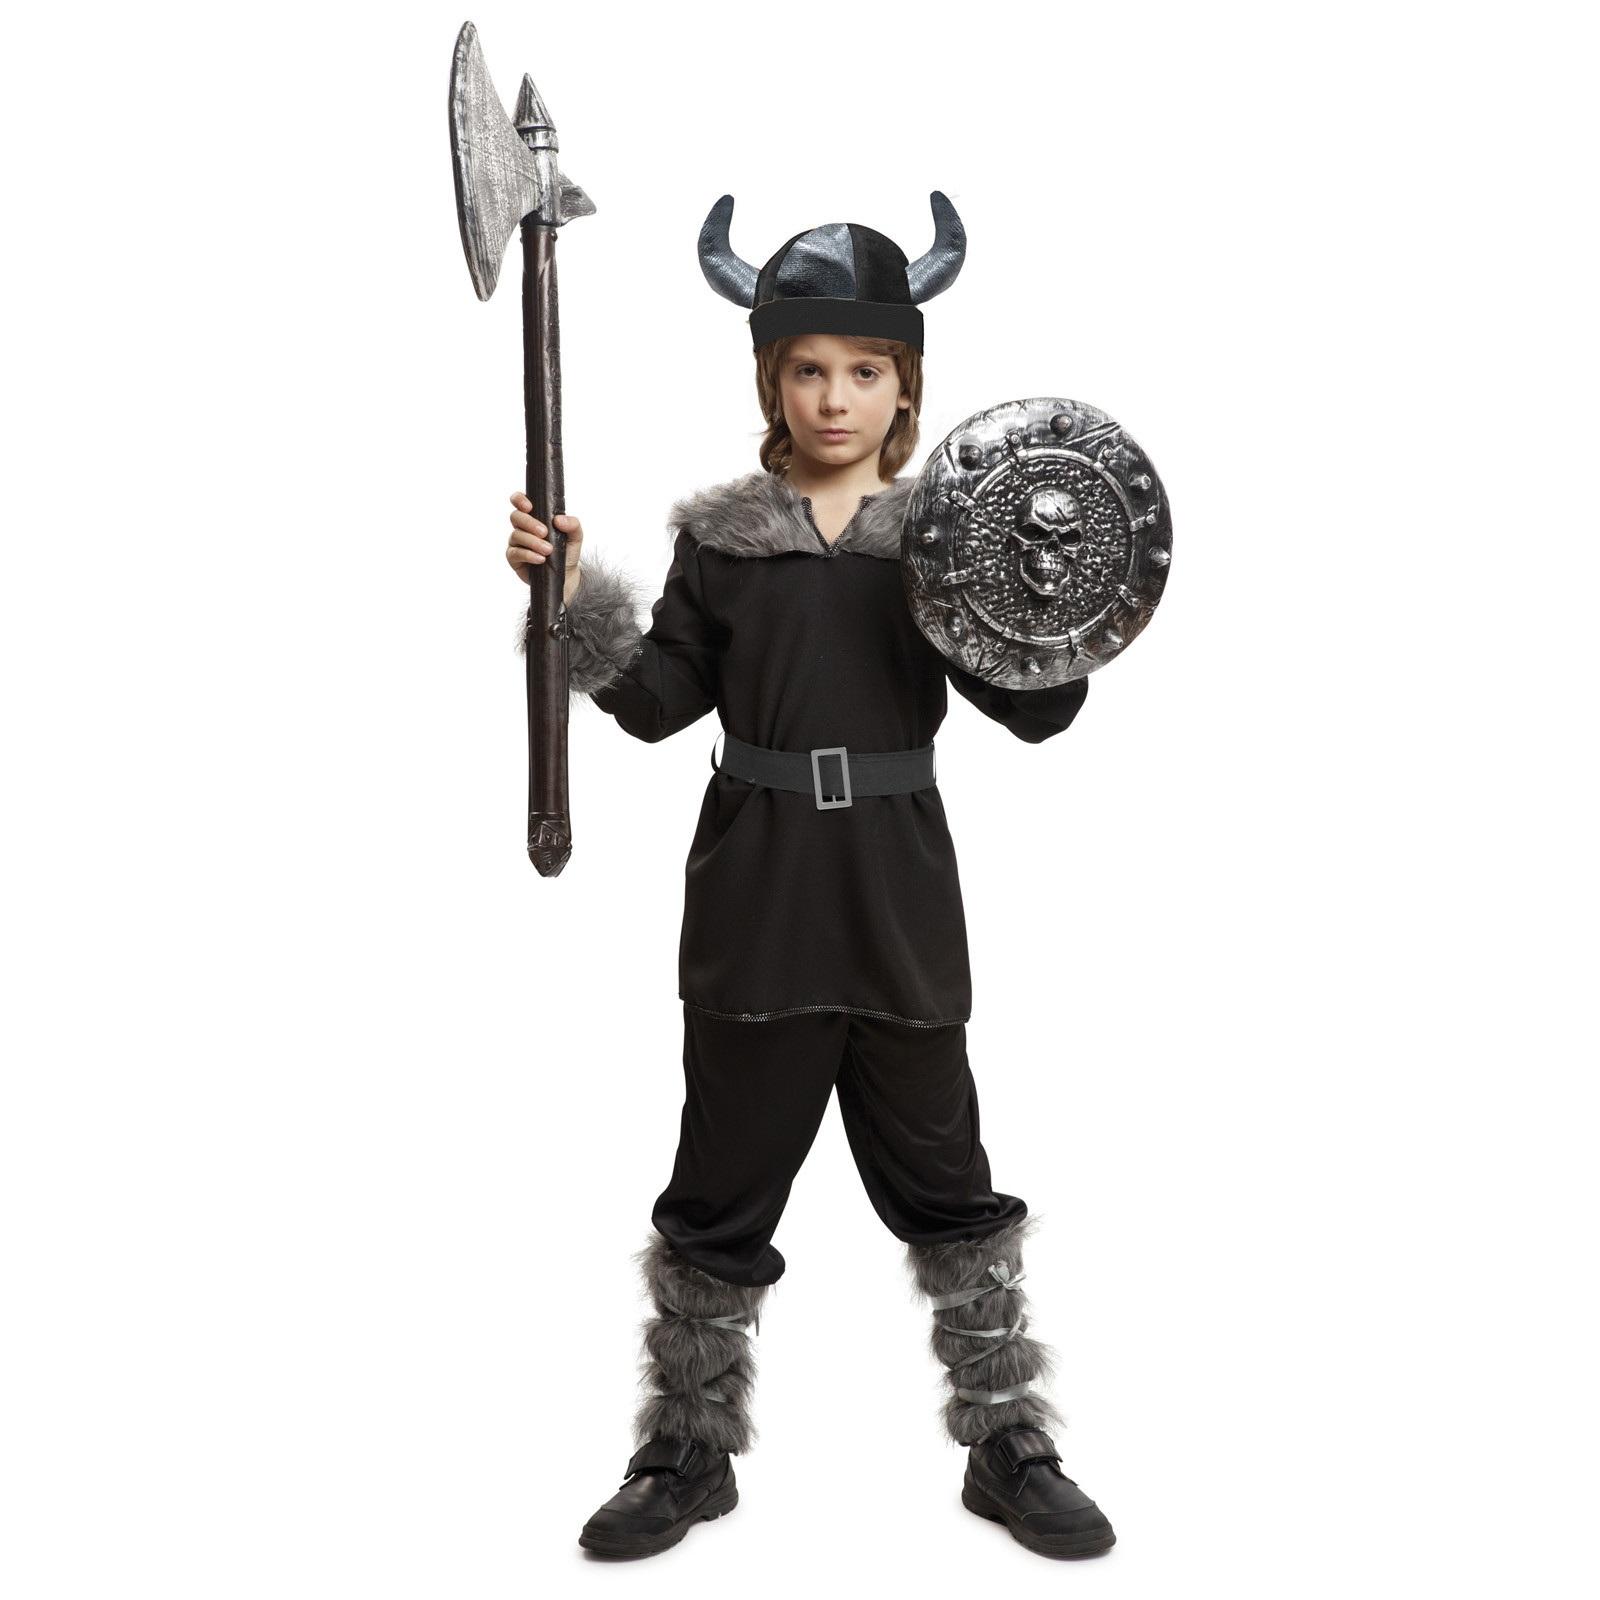 disfraz vikingo salvaje bebé niño 203335mom - DISFRAZ DE VIKINGO SALVAJE BEBE NIÑO